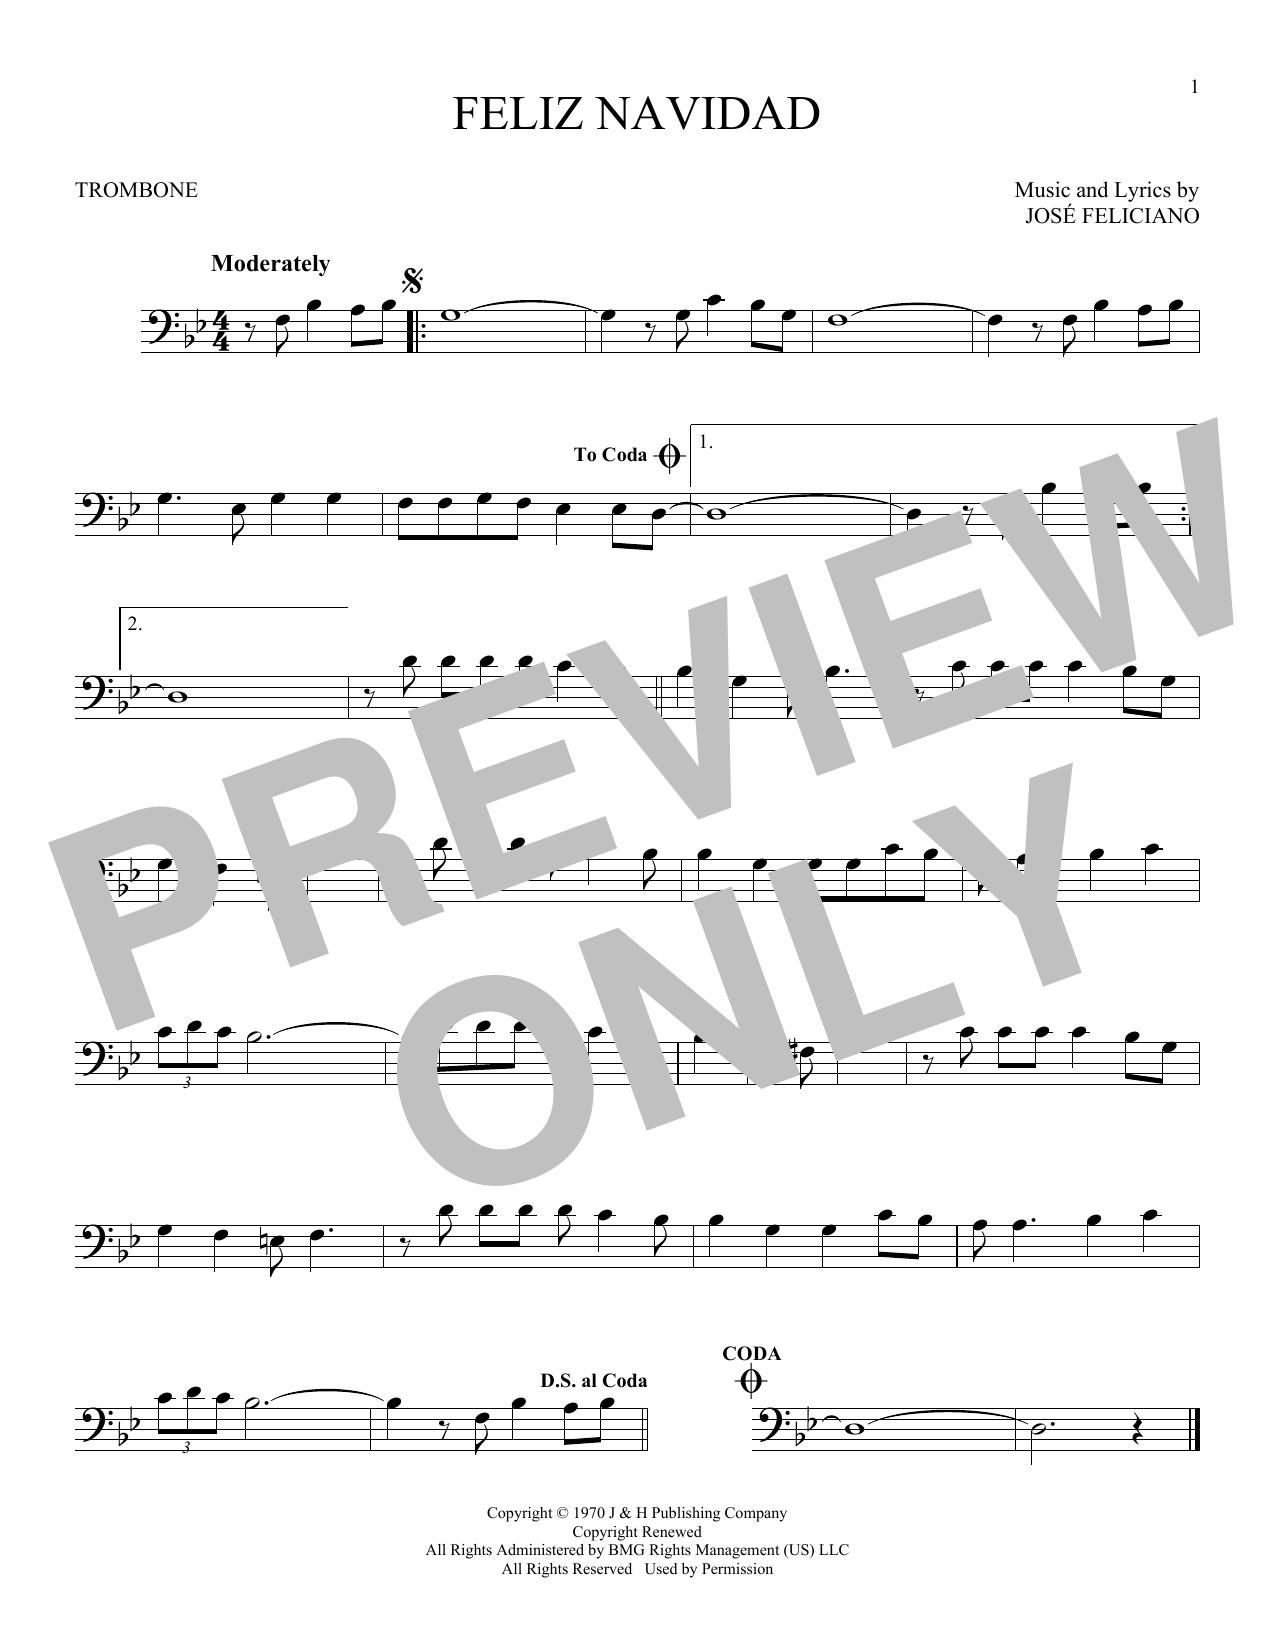 Feliz Navidad (Trombone Solo)